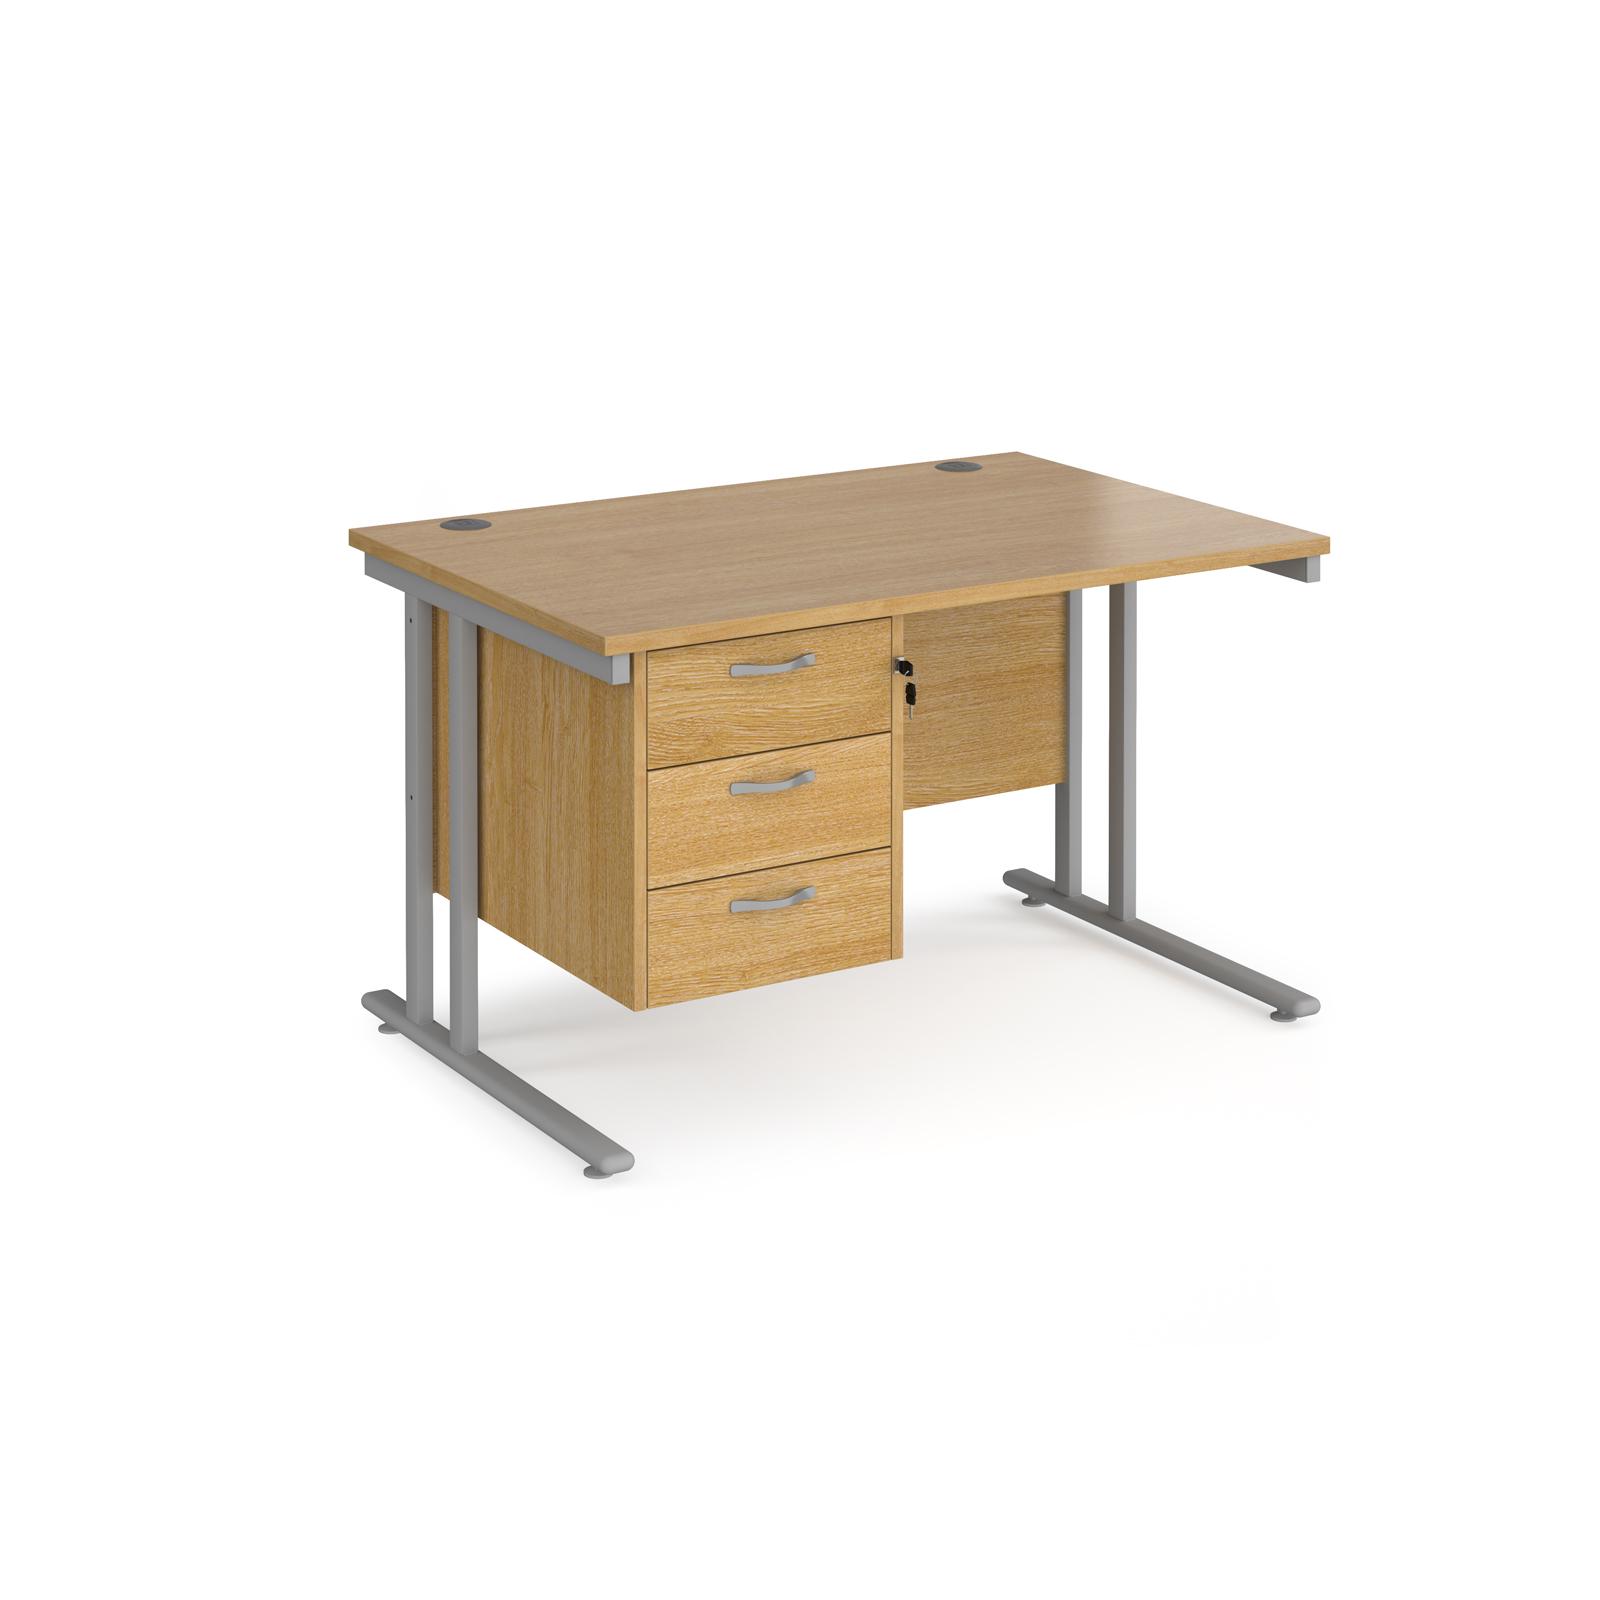 Rectangular Desks Maestro 25 straight desk 1200mm x 800mm with 3 drawer pedestal - silver cantilever leg frame, oak top